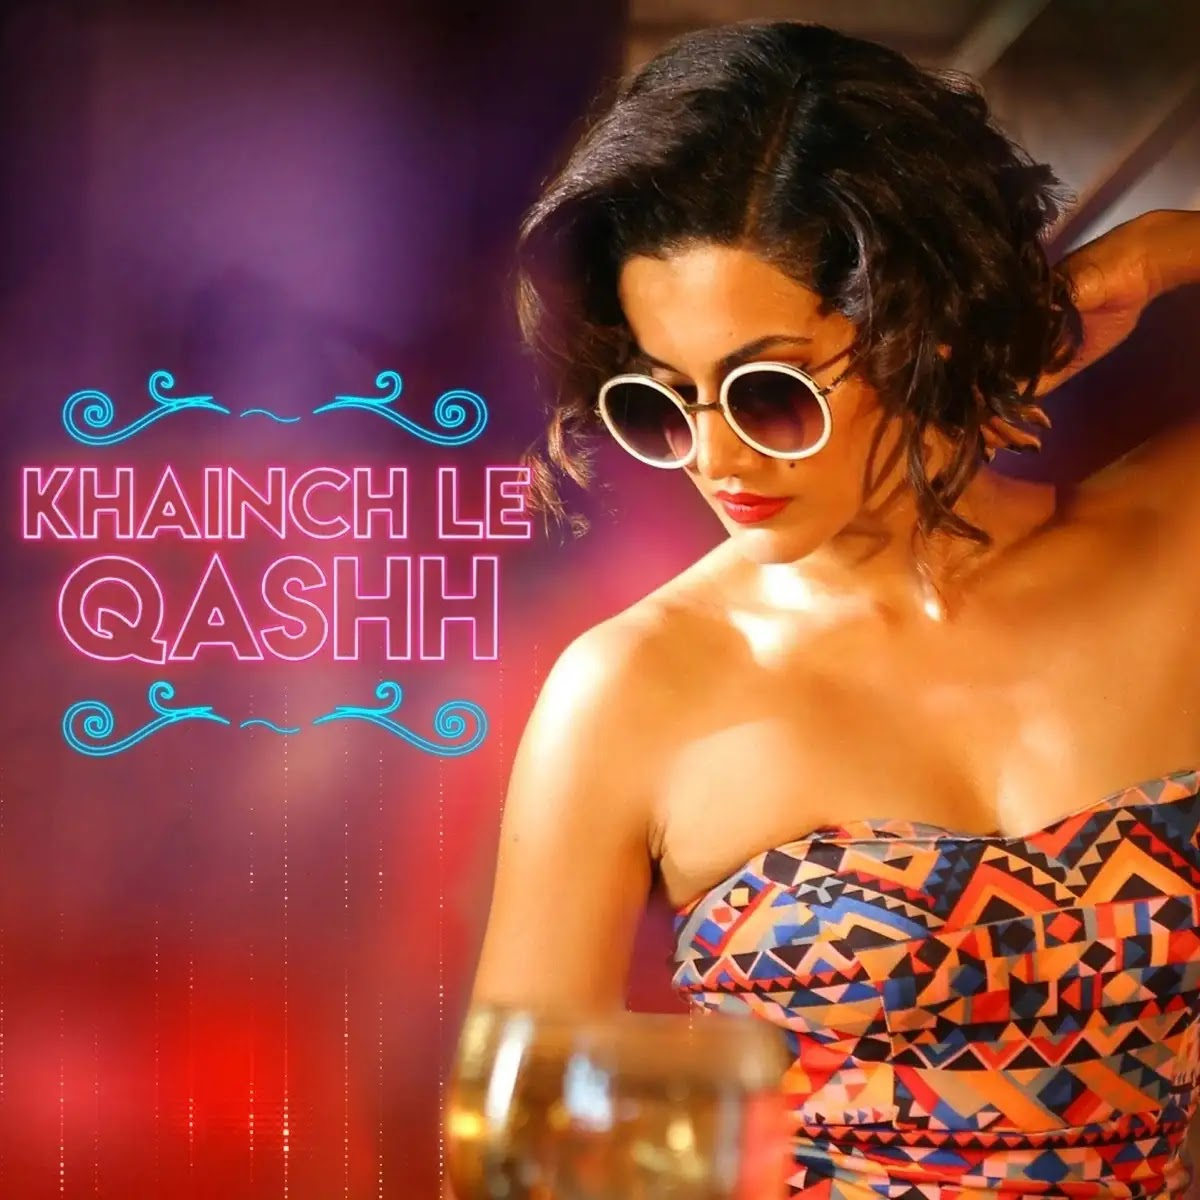 Khainch Le Qashh Raftaar Song MP3 Download 320kbps